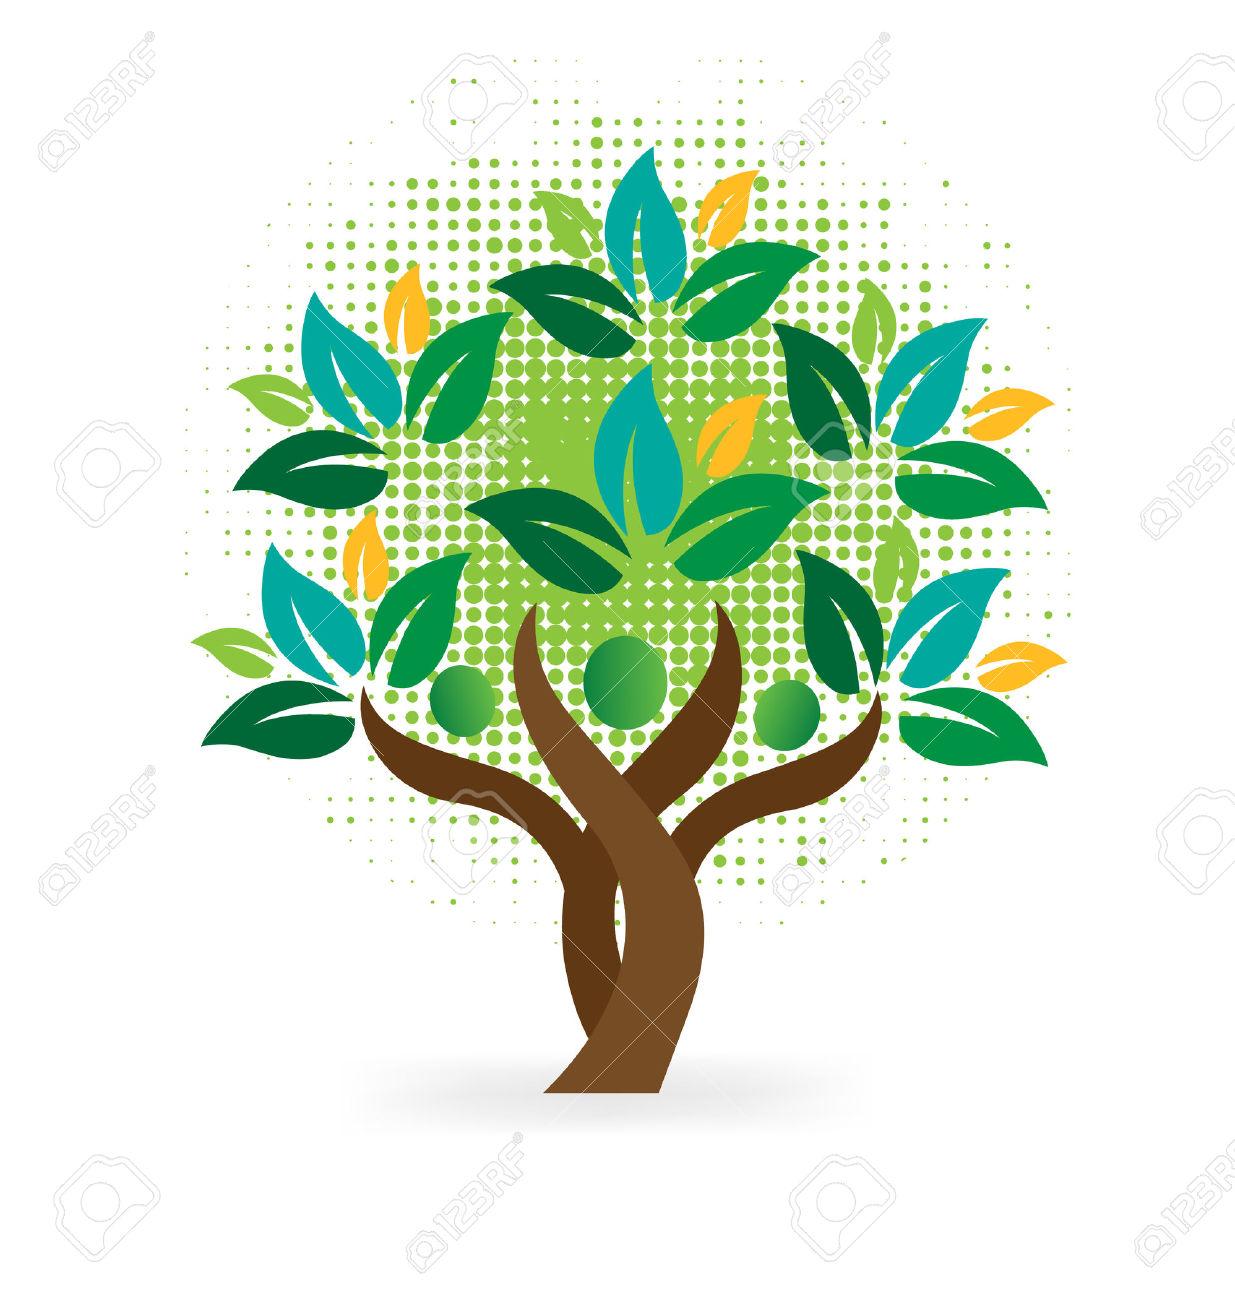 1235x1300 Clipart Tree Of Life